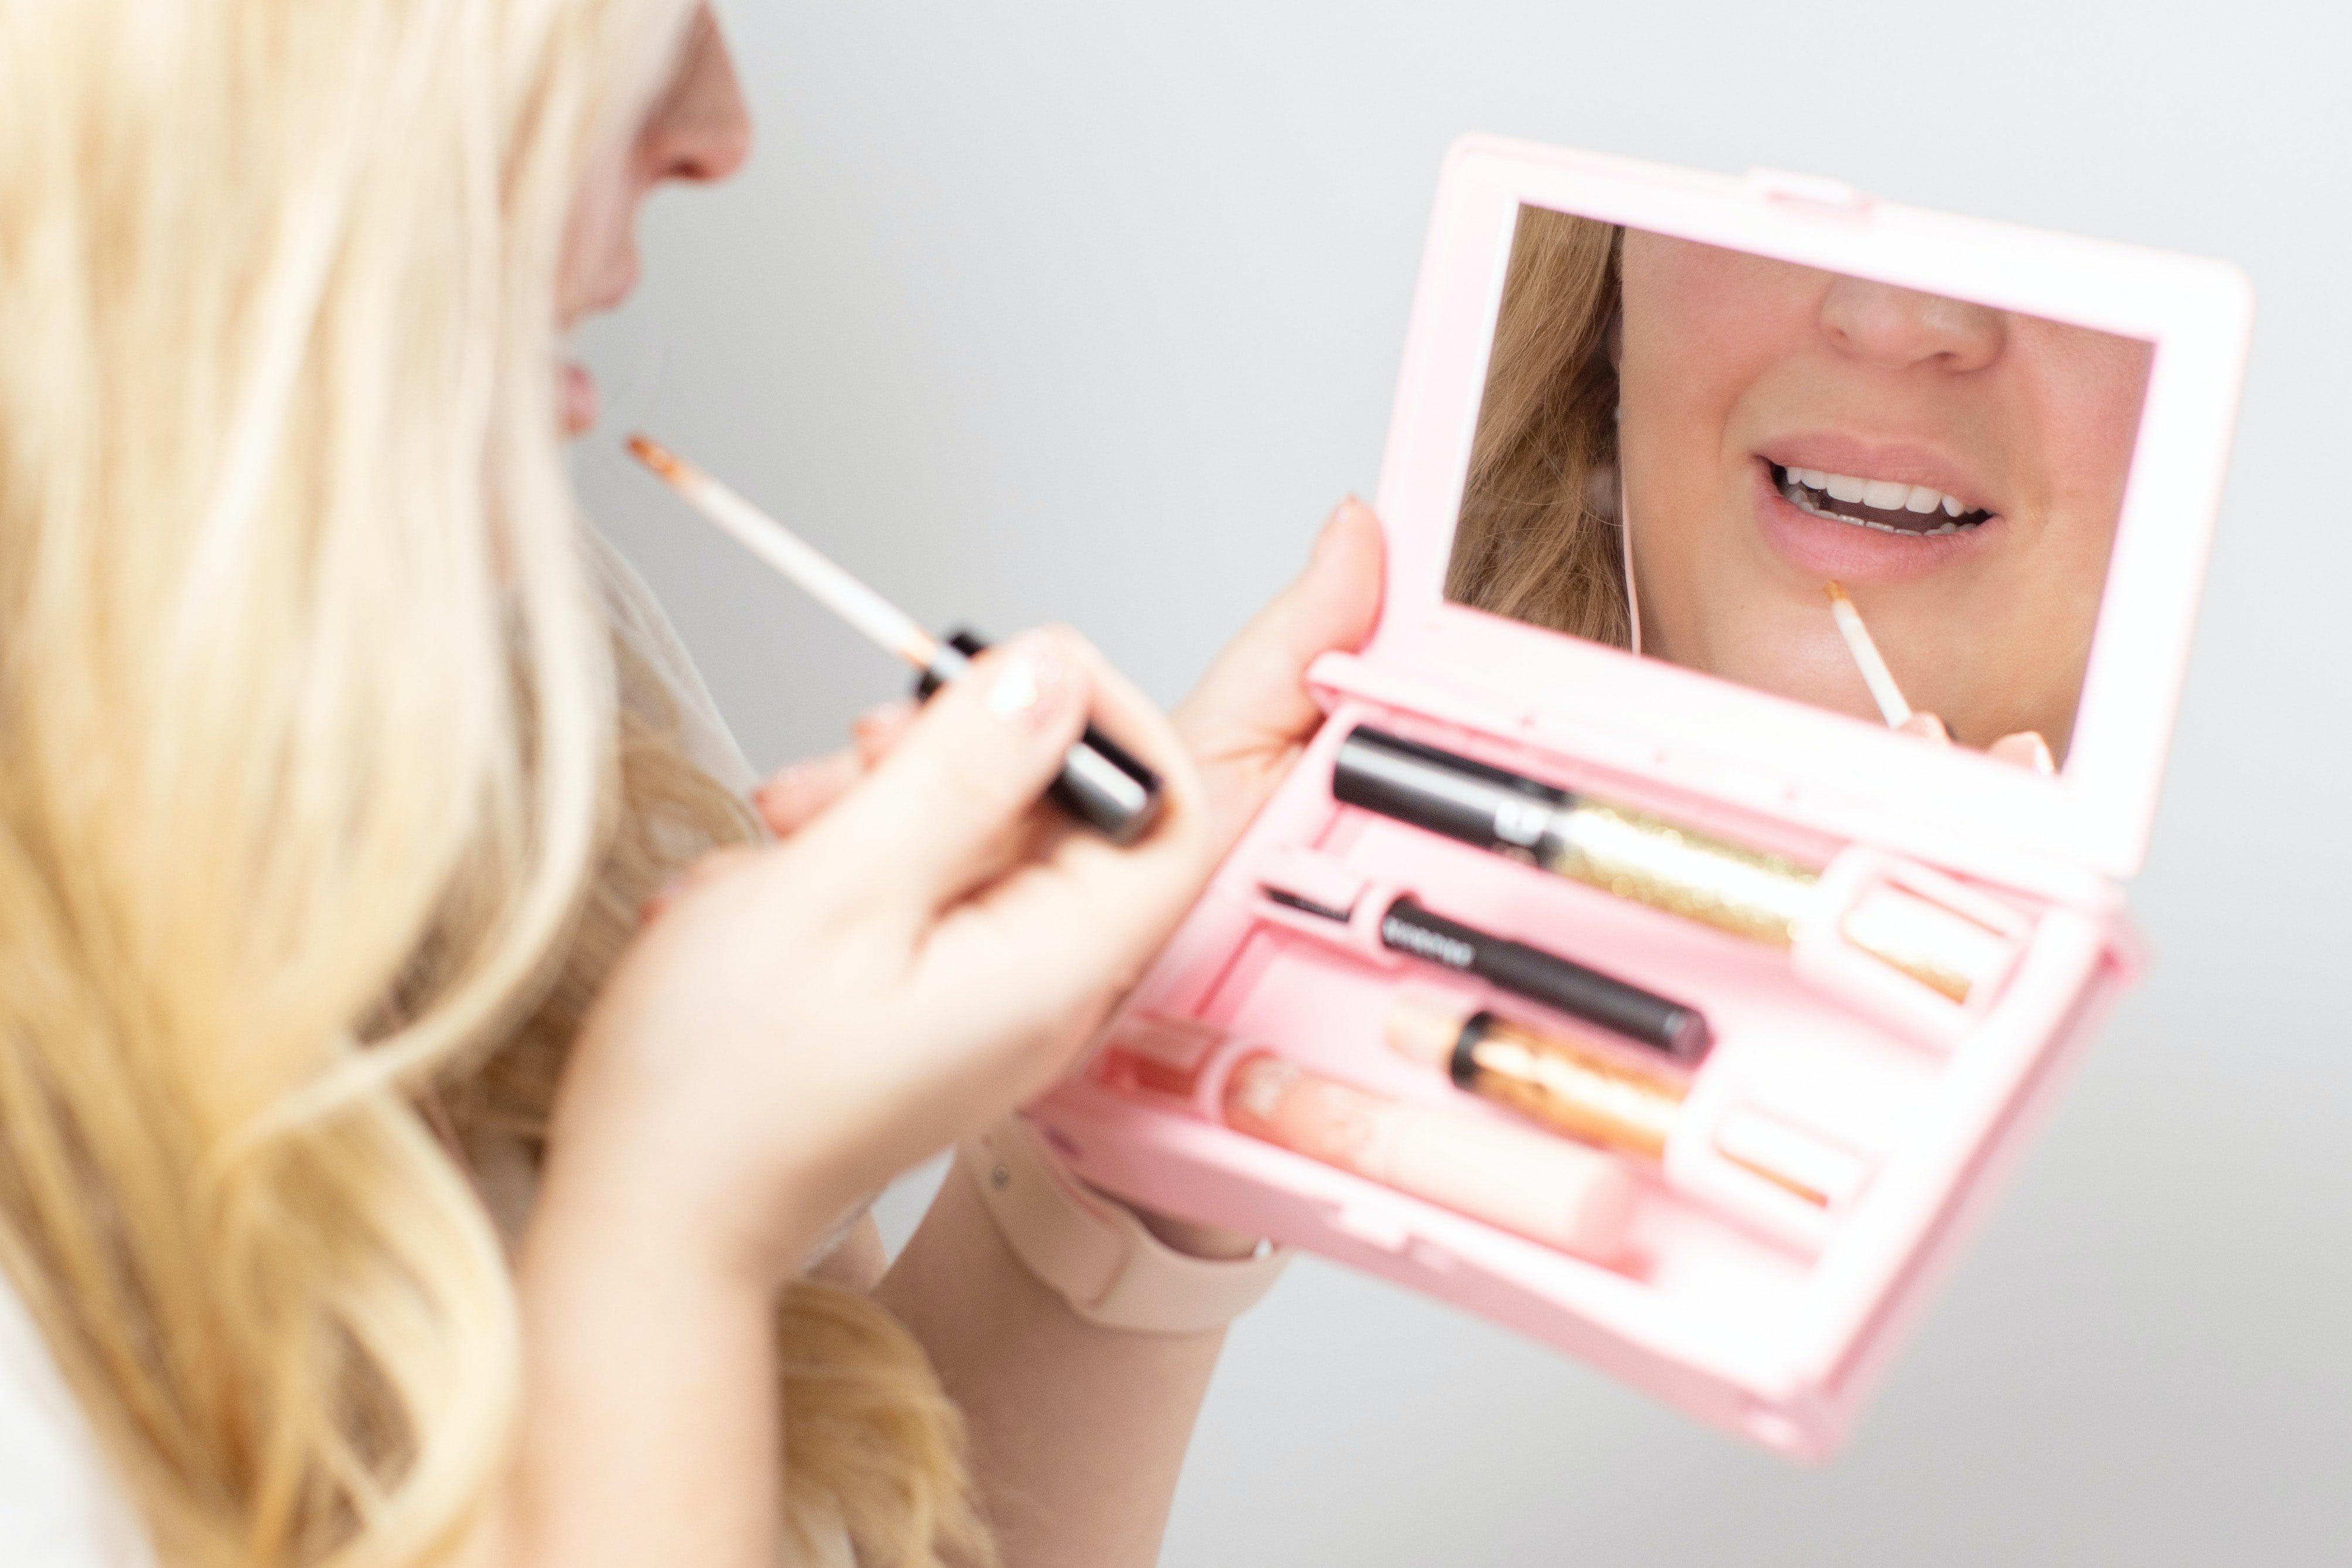 Person applying makeup